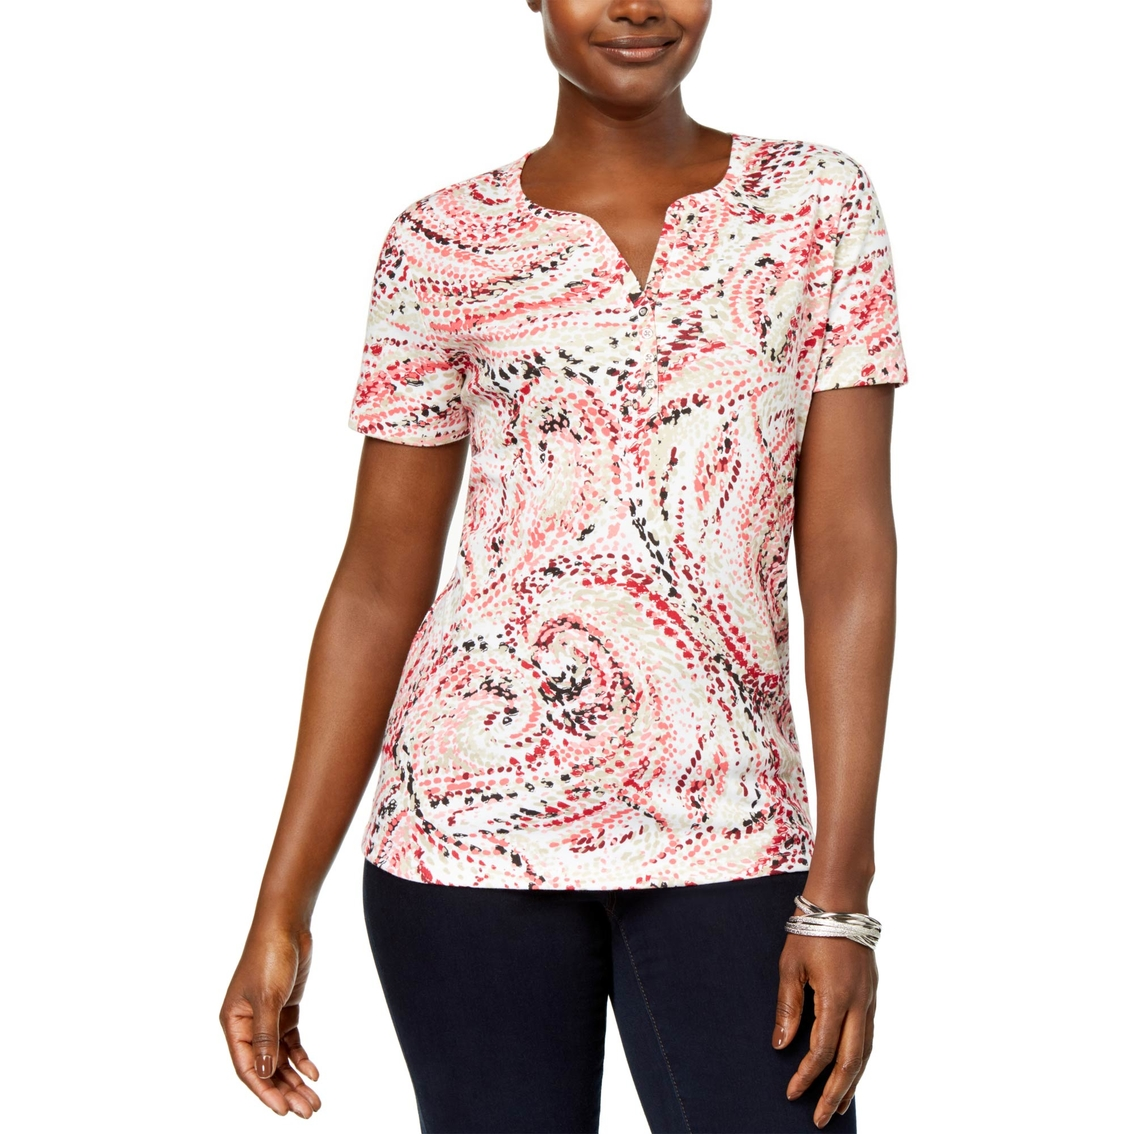 49f29aa2 Karen Scott Printed Henley Tee | T-shirts | Apparel | Shop The Exchange